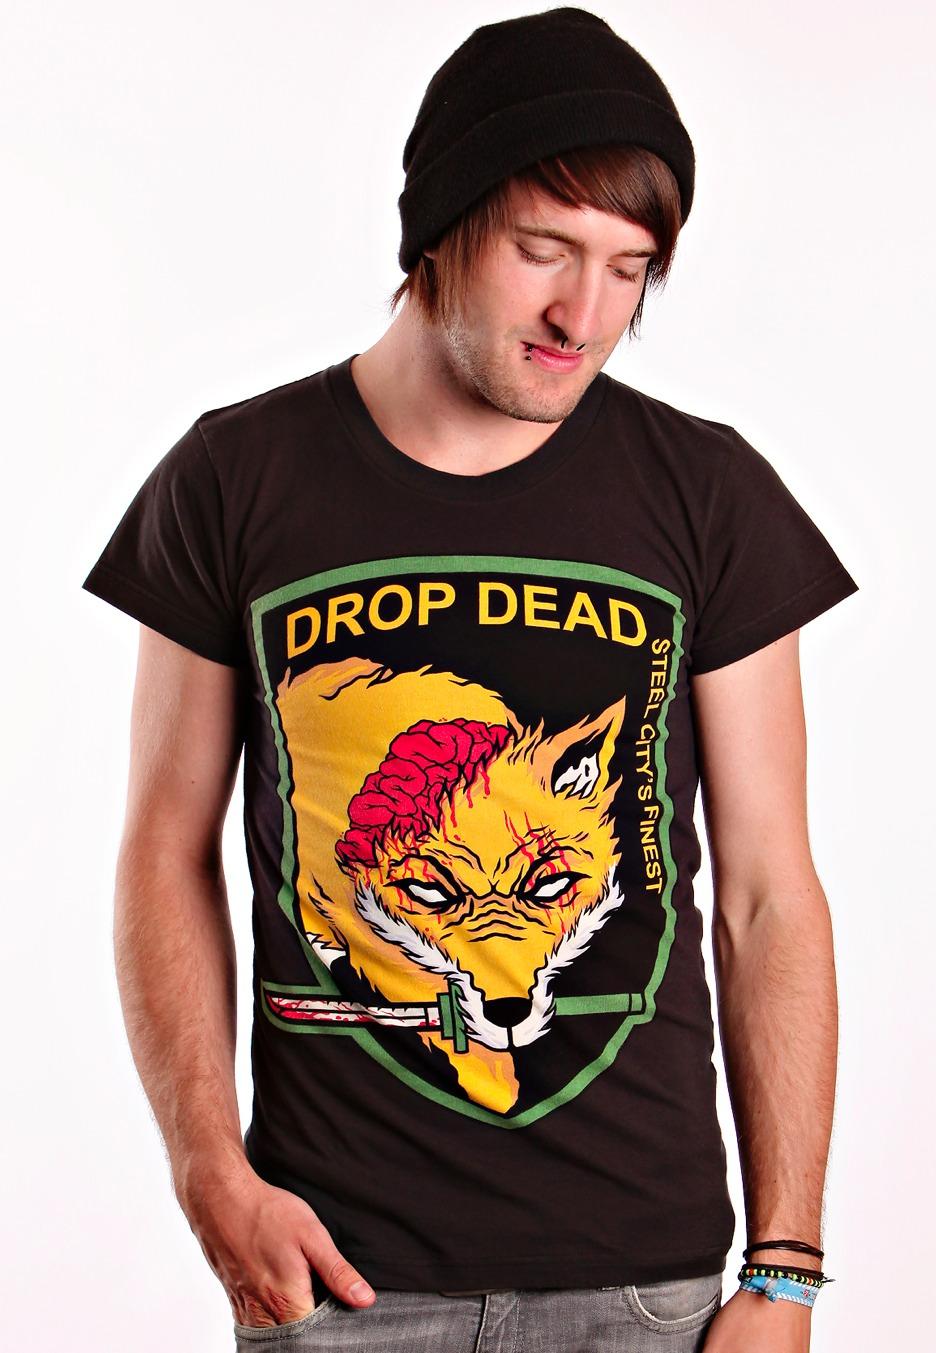 Drop Dead - Big Boss - T-Shirt - Impericon.com Worldwide